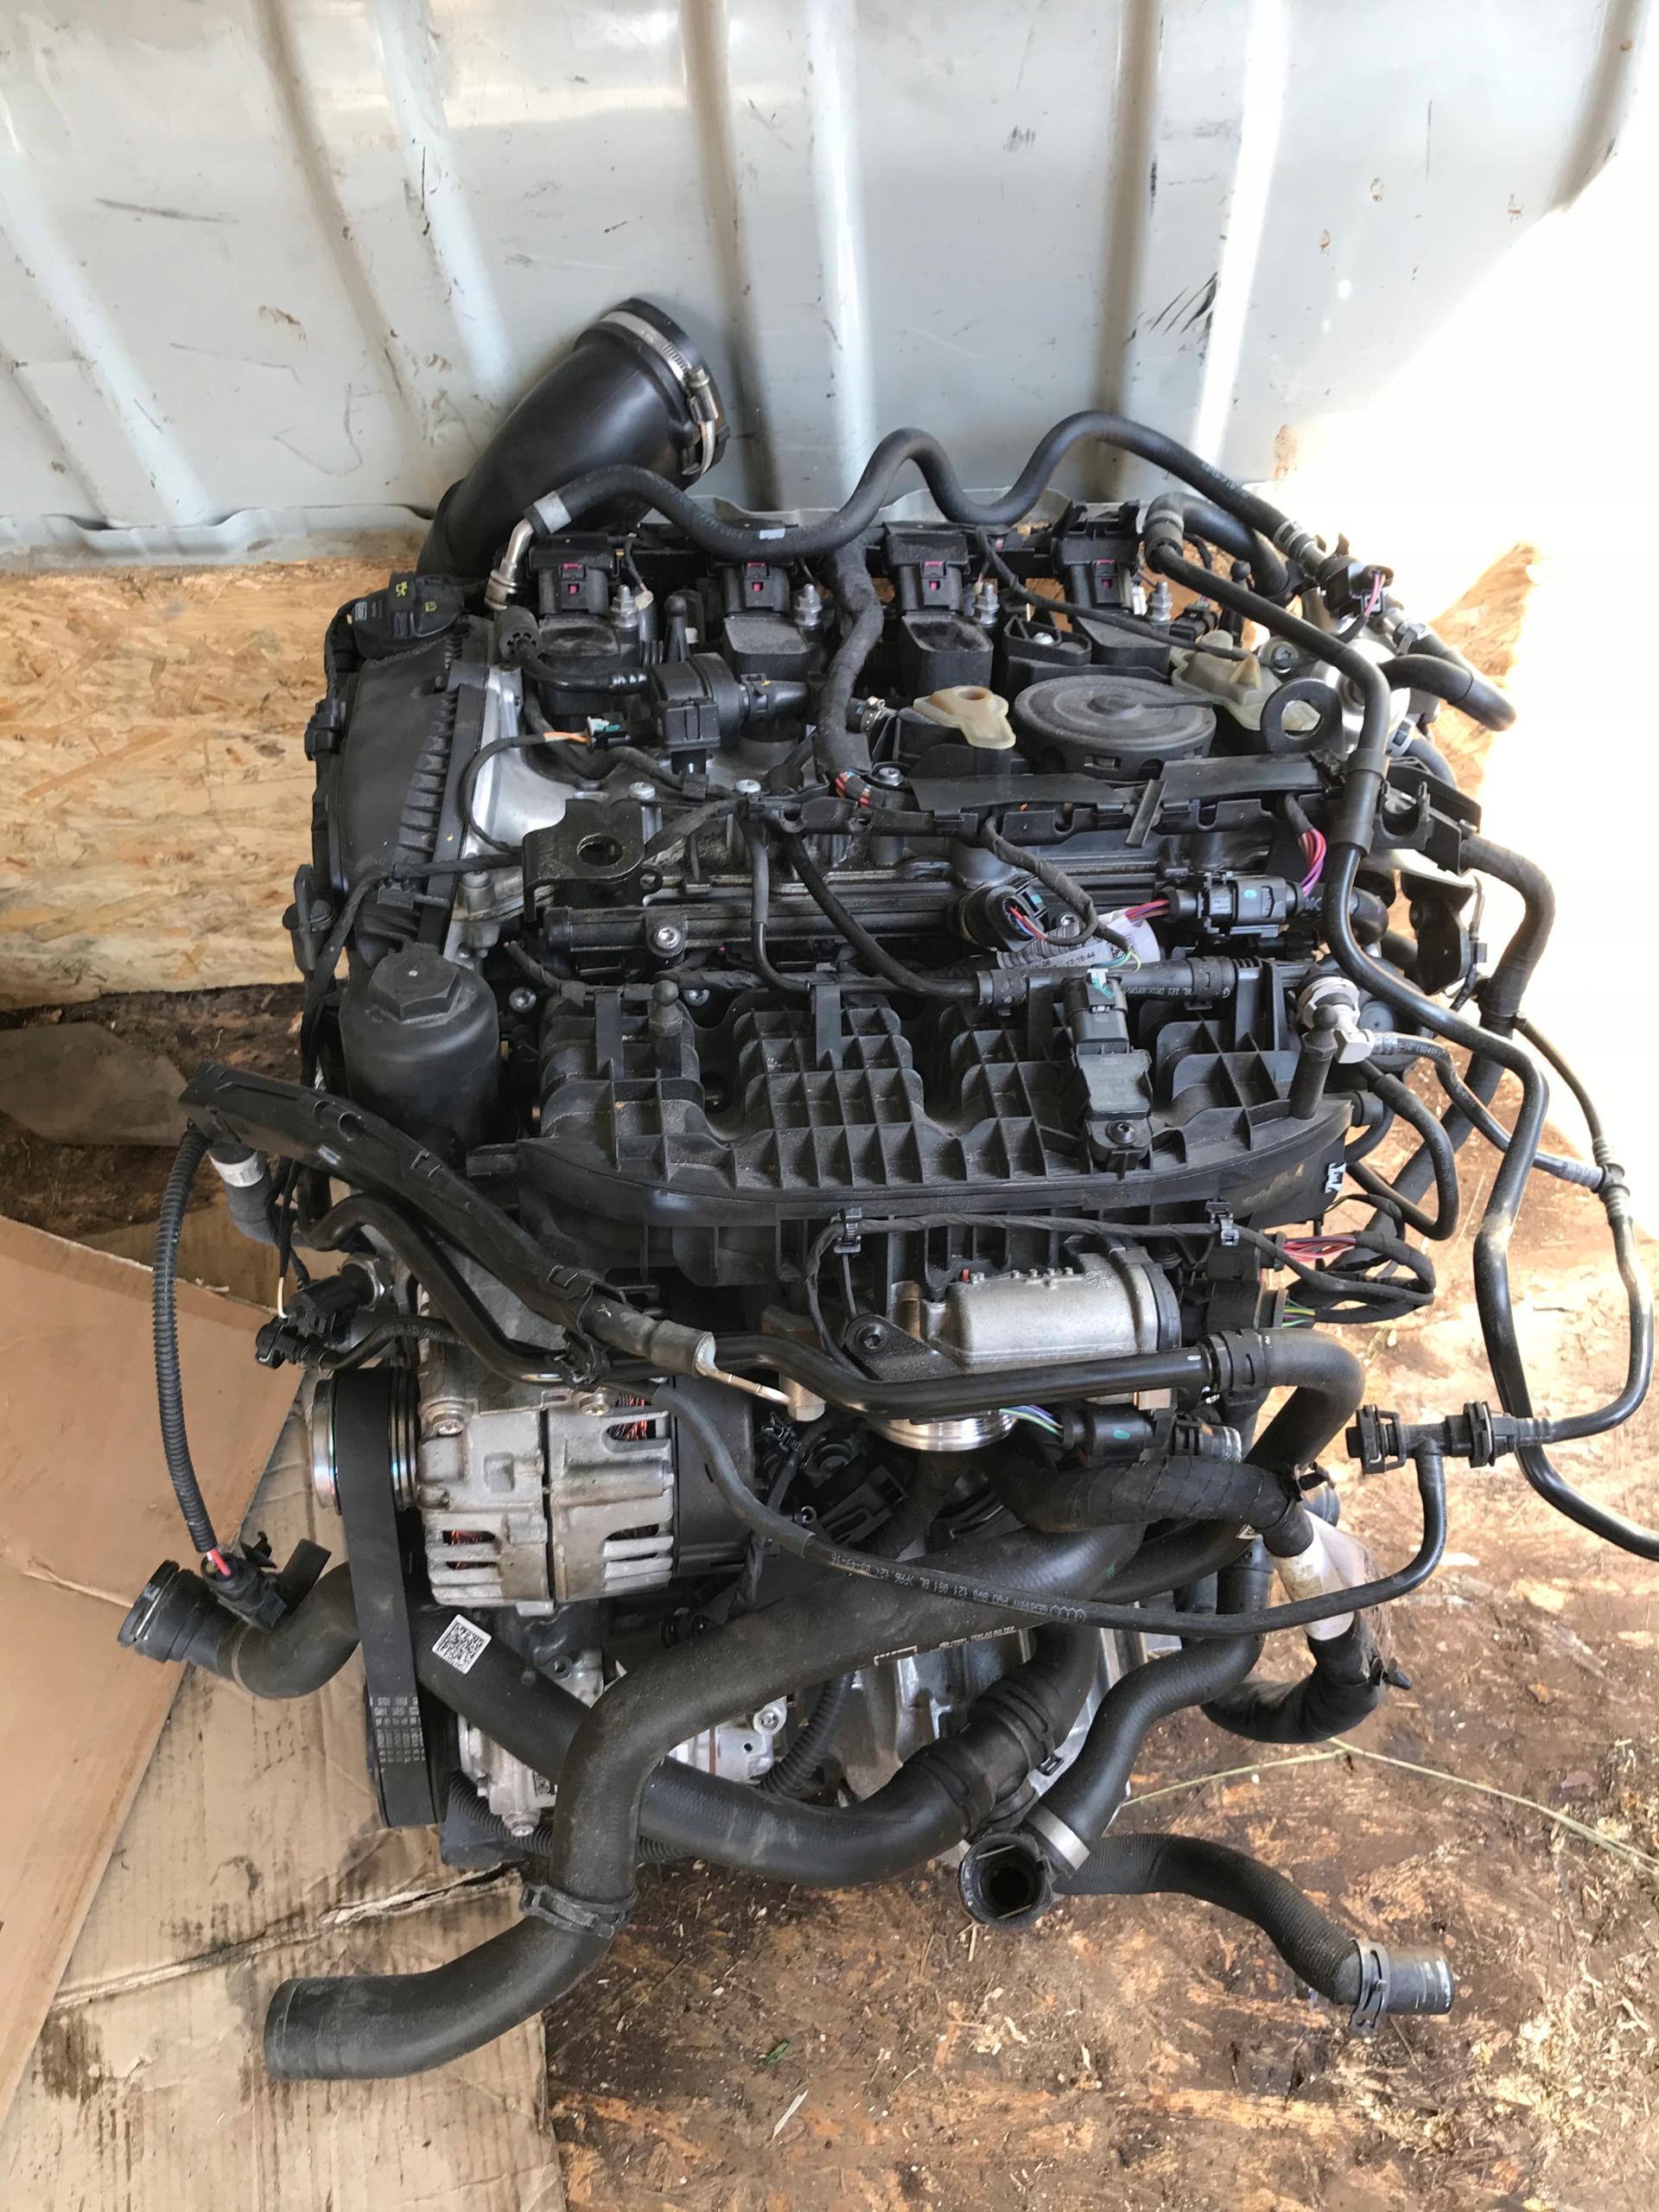 двигатель столбик audi a4 b9 a5 q5 8w f5 cyr 20 tfsi